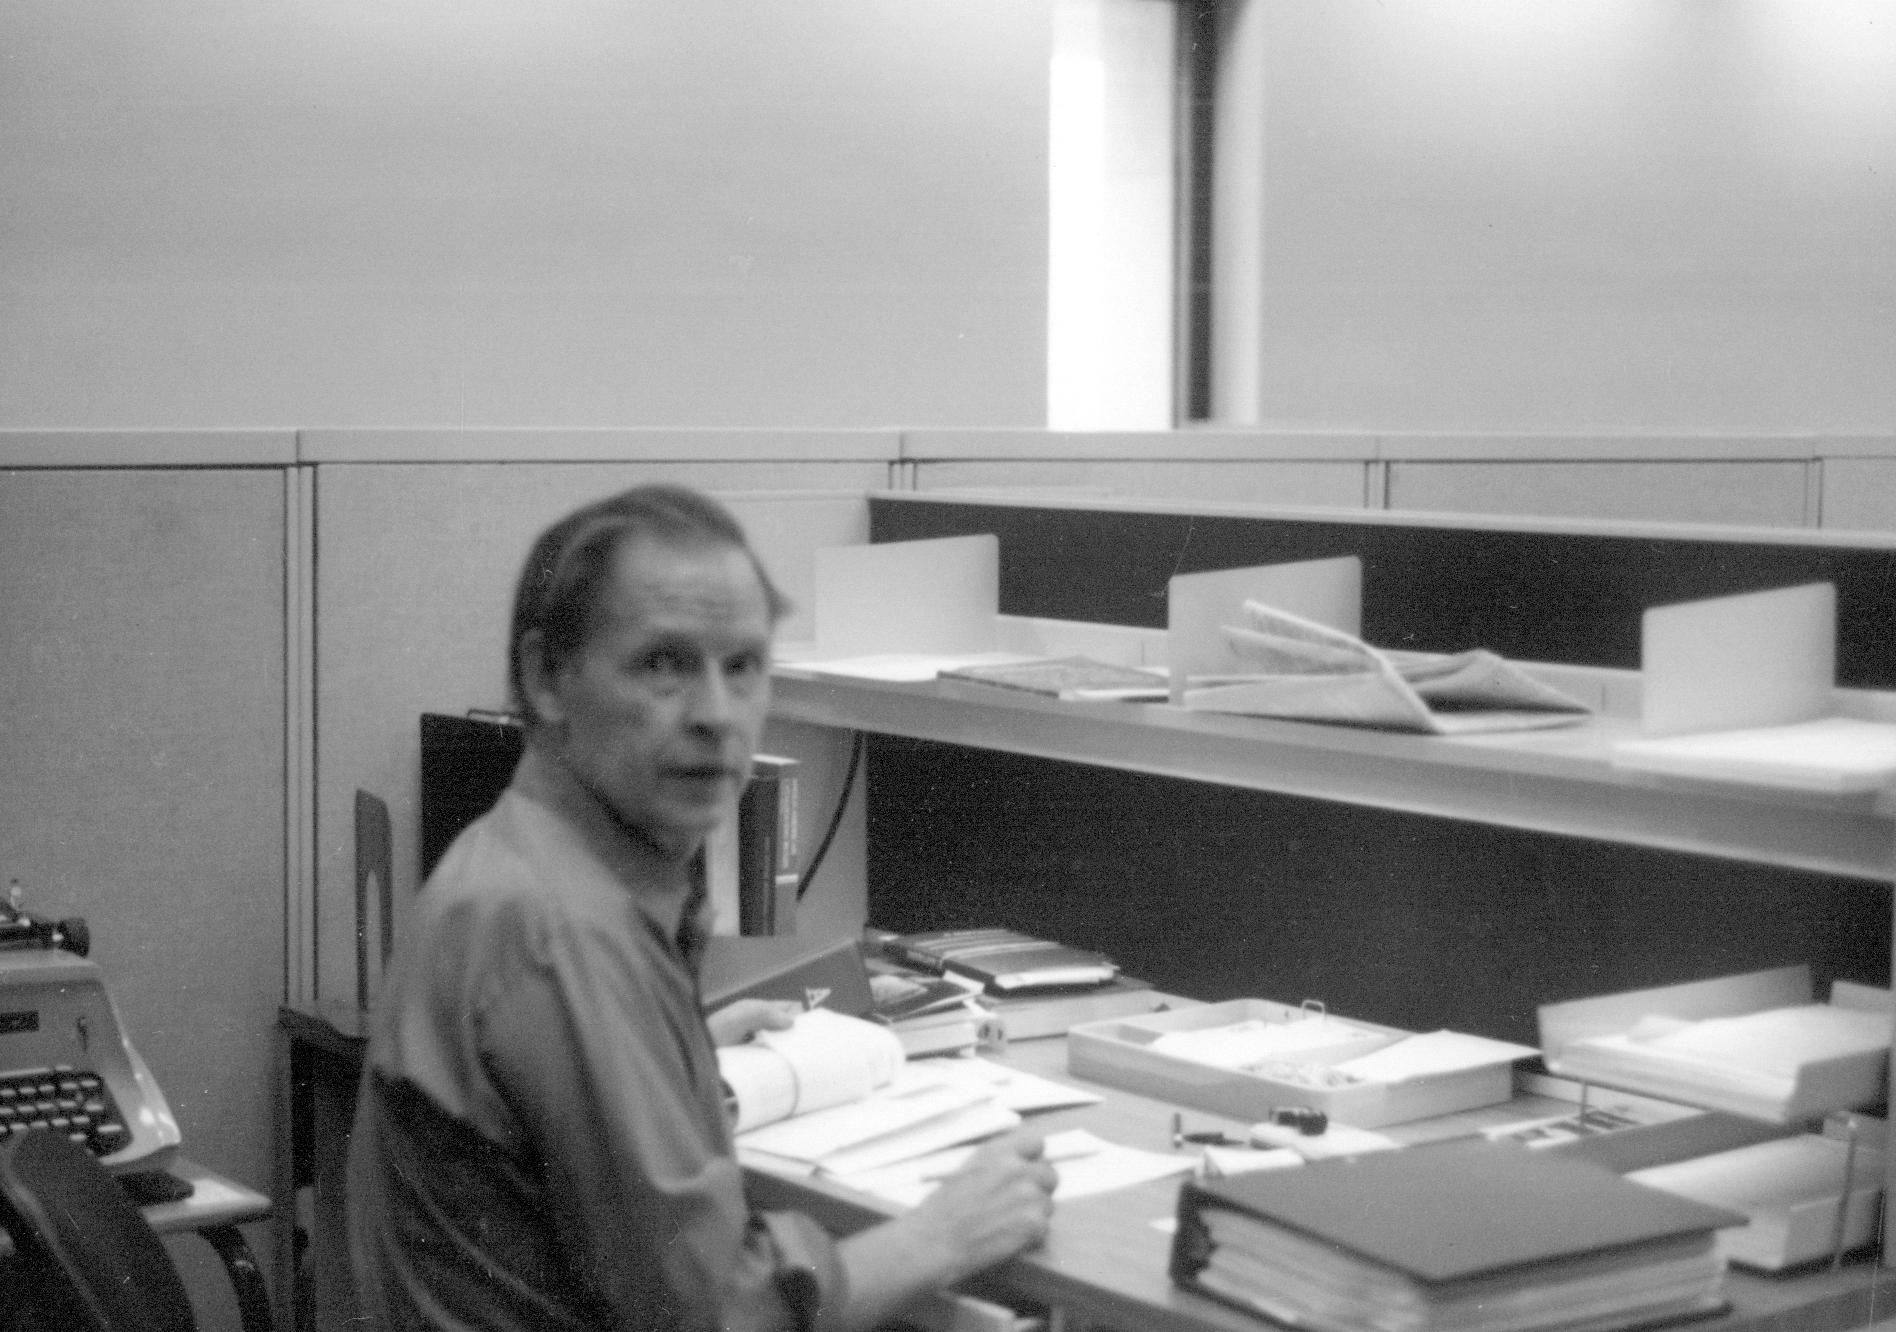 Prie darbo stalo Kongreso bibliotekoje (Library of Congress)